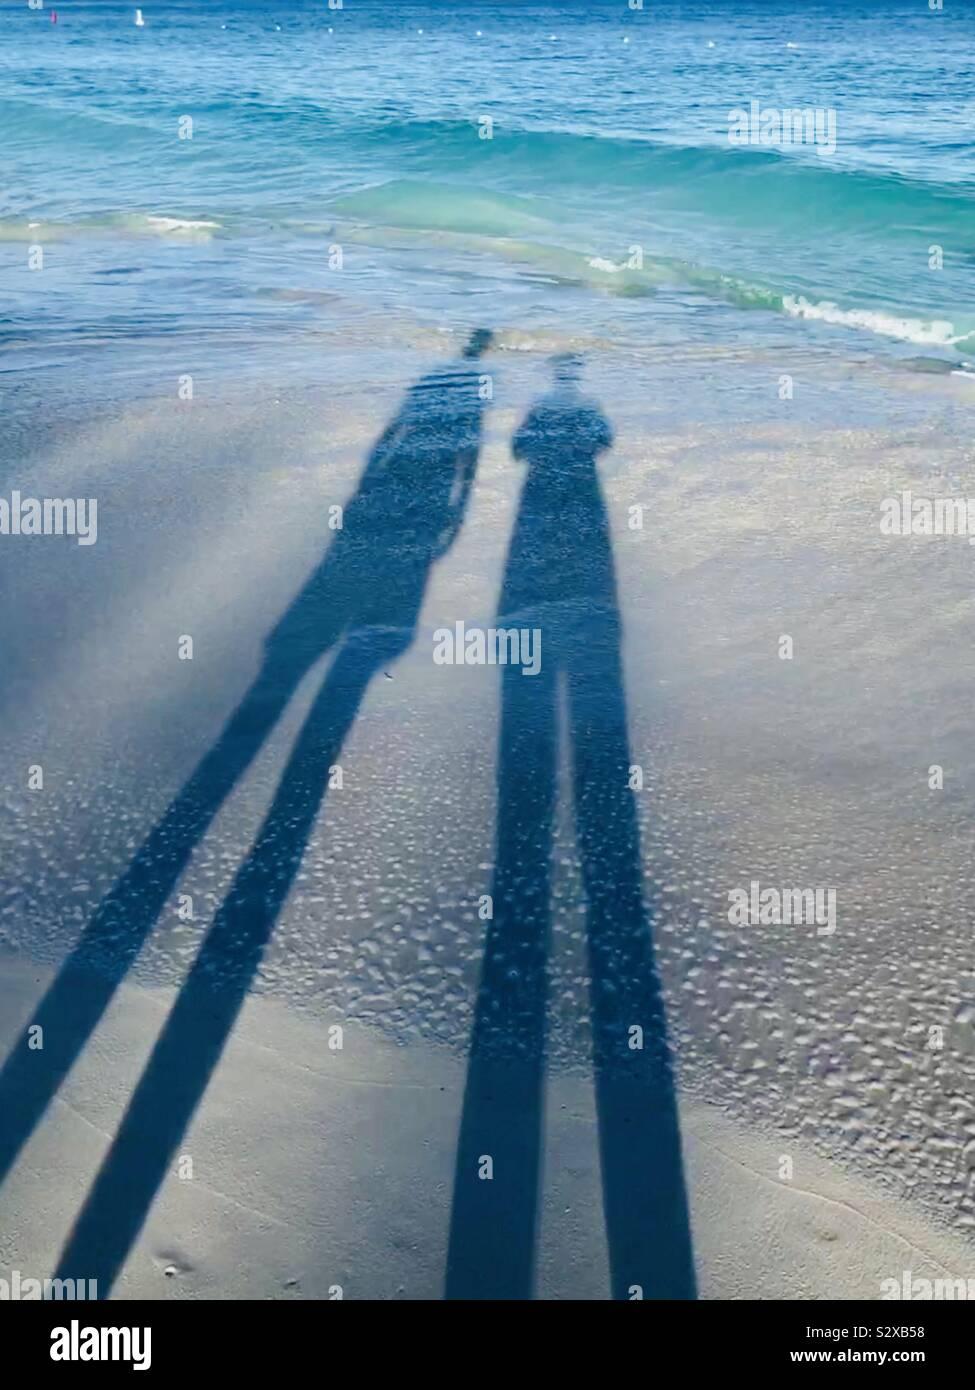 Shadow In Water : shadow, water, Shadows, Water, Beach, Stock, Photo, Alamy